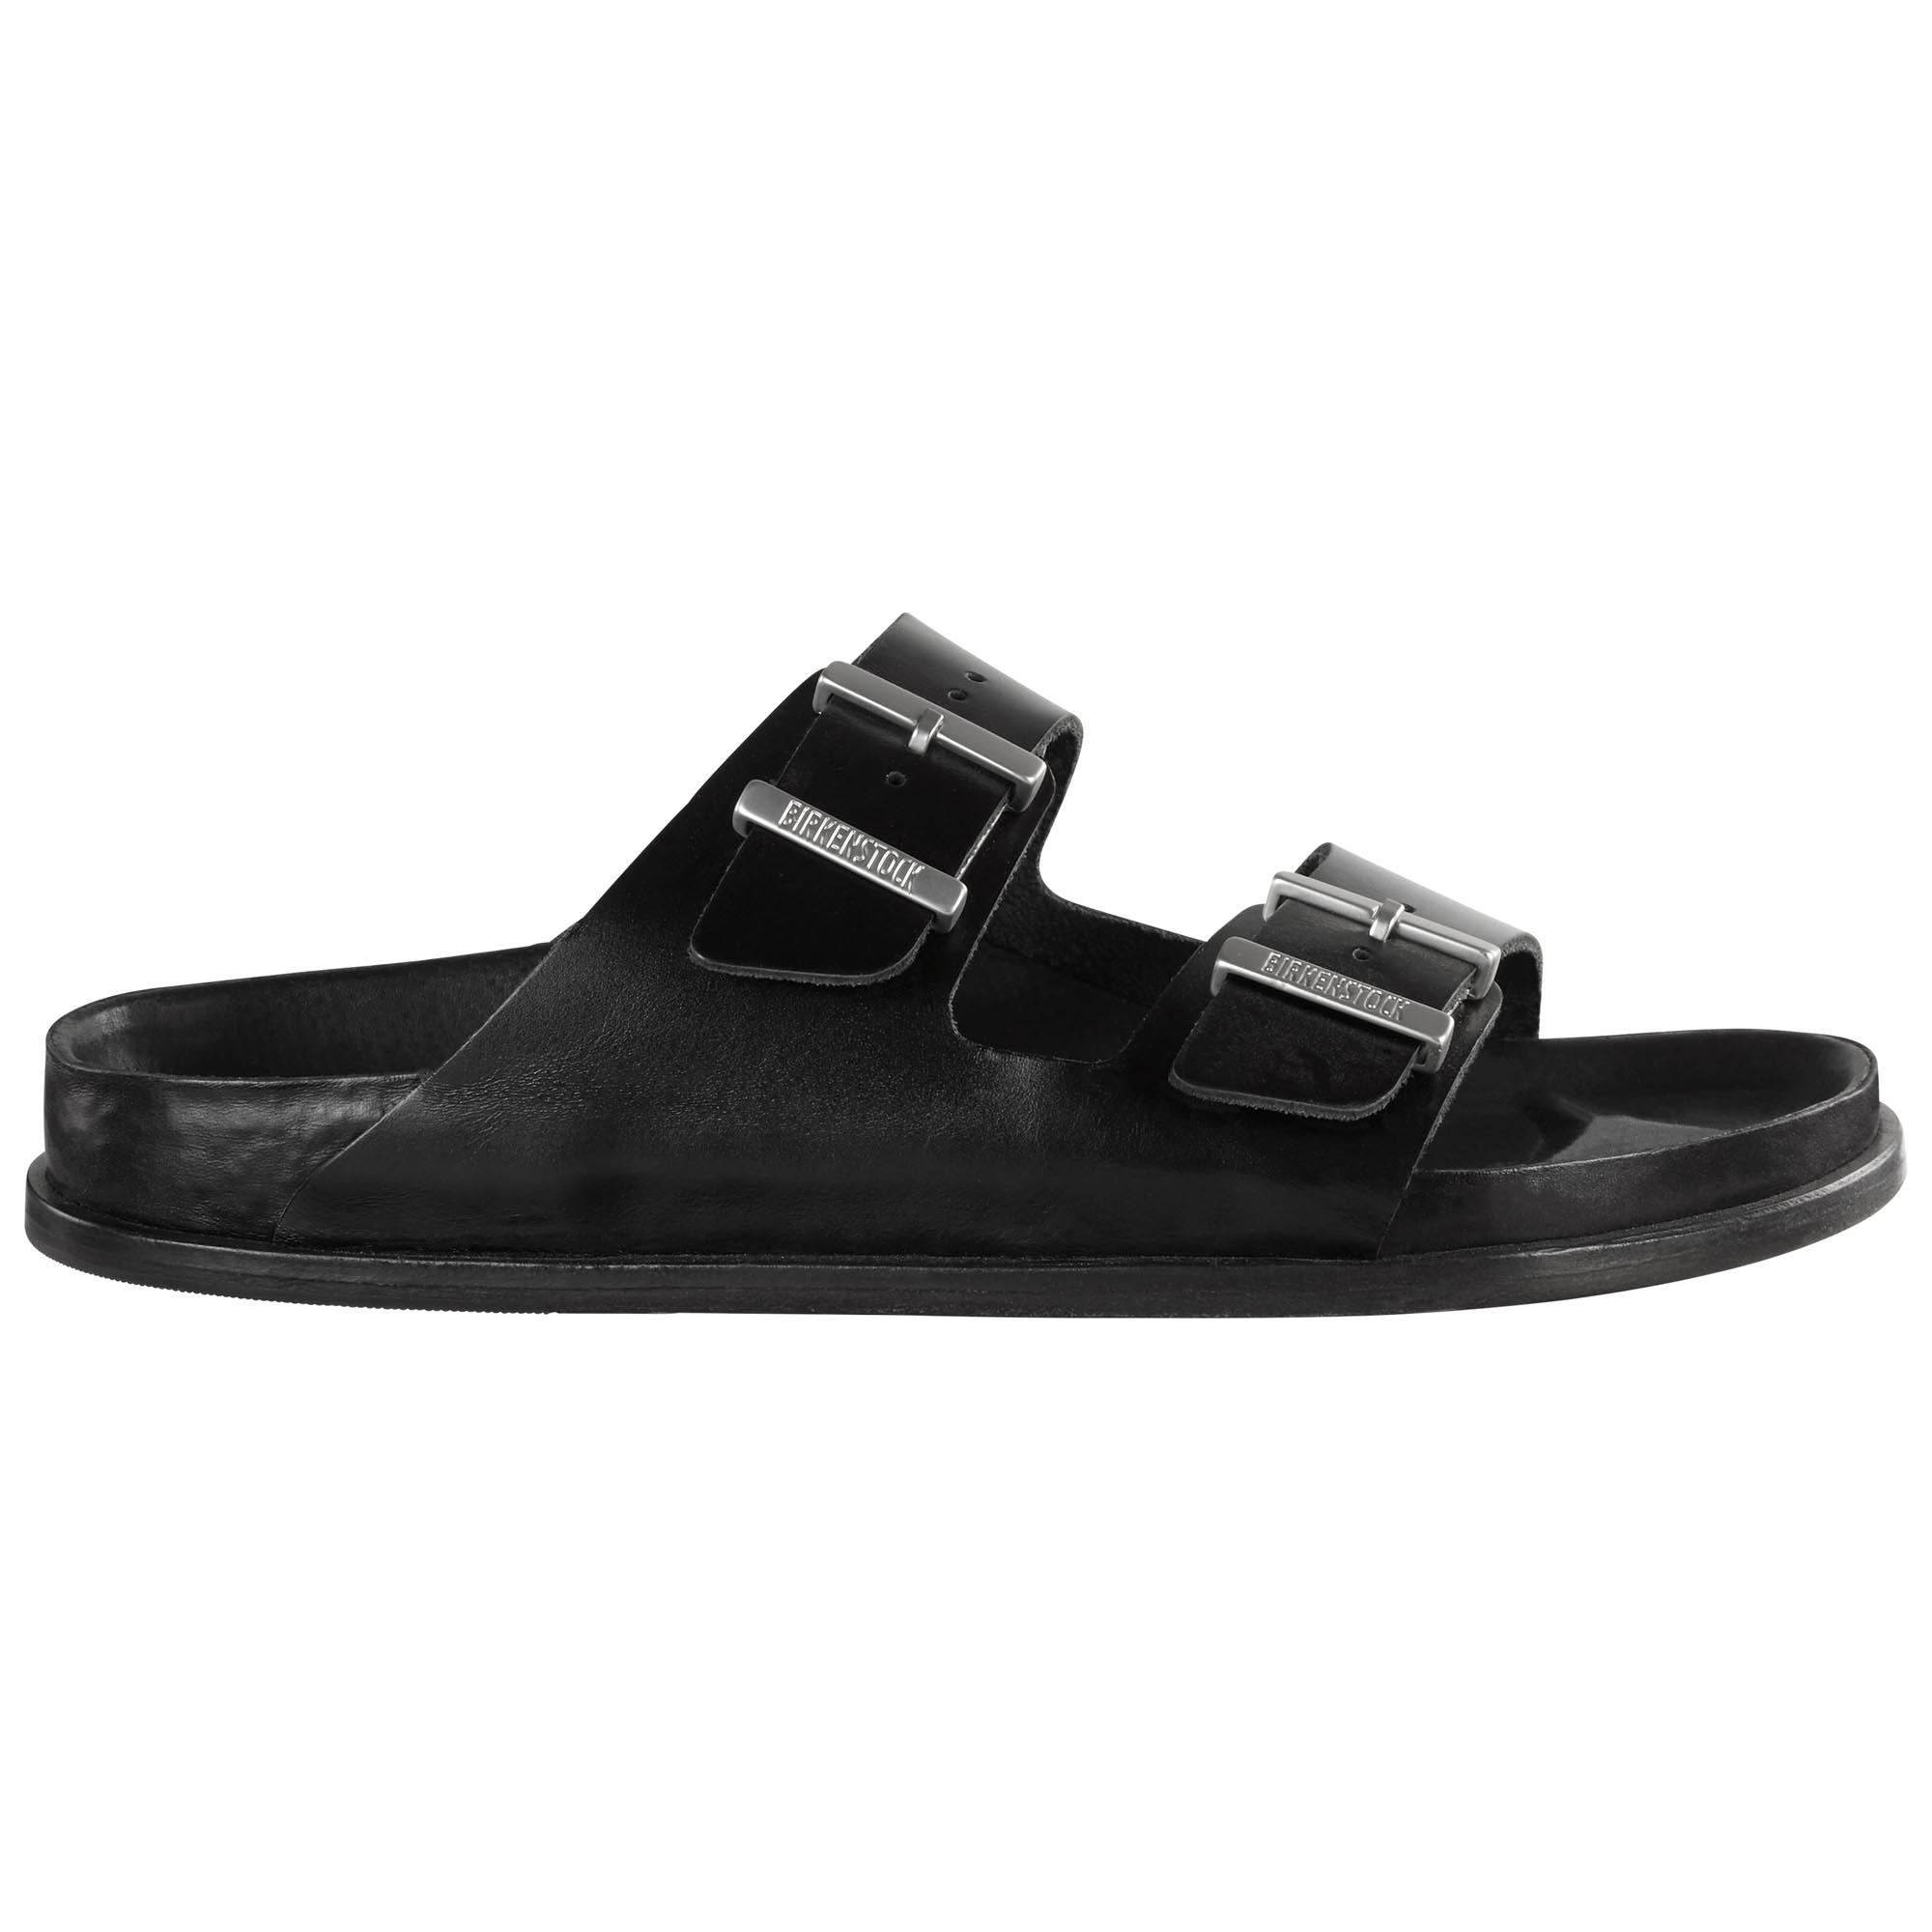 all black leather birkenstocks